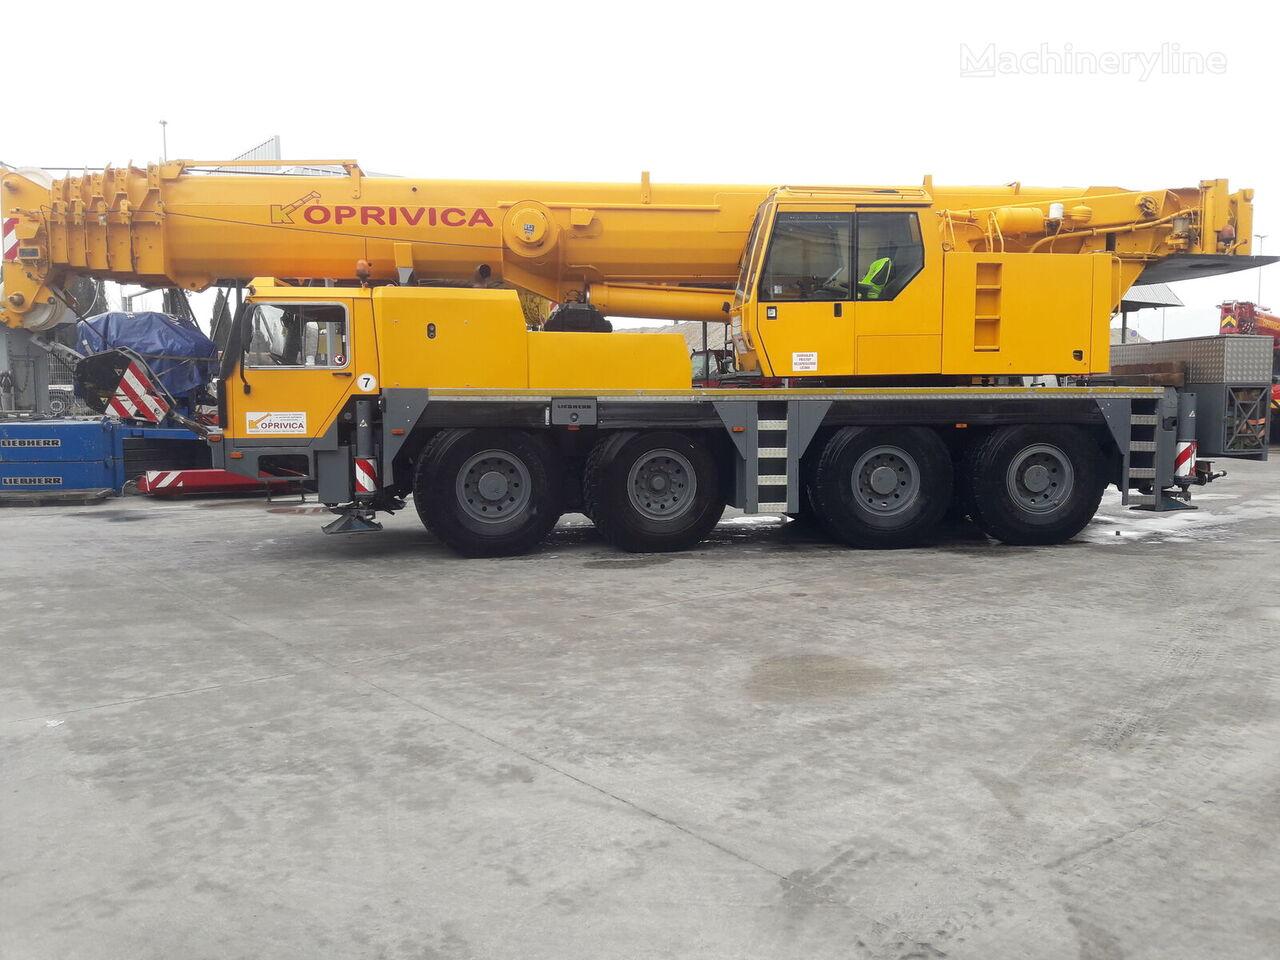 LIEBHERR LTM 1090 - 2 mobile crane